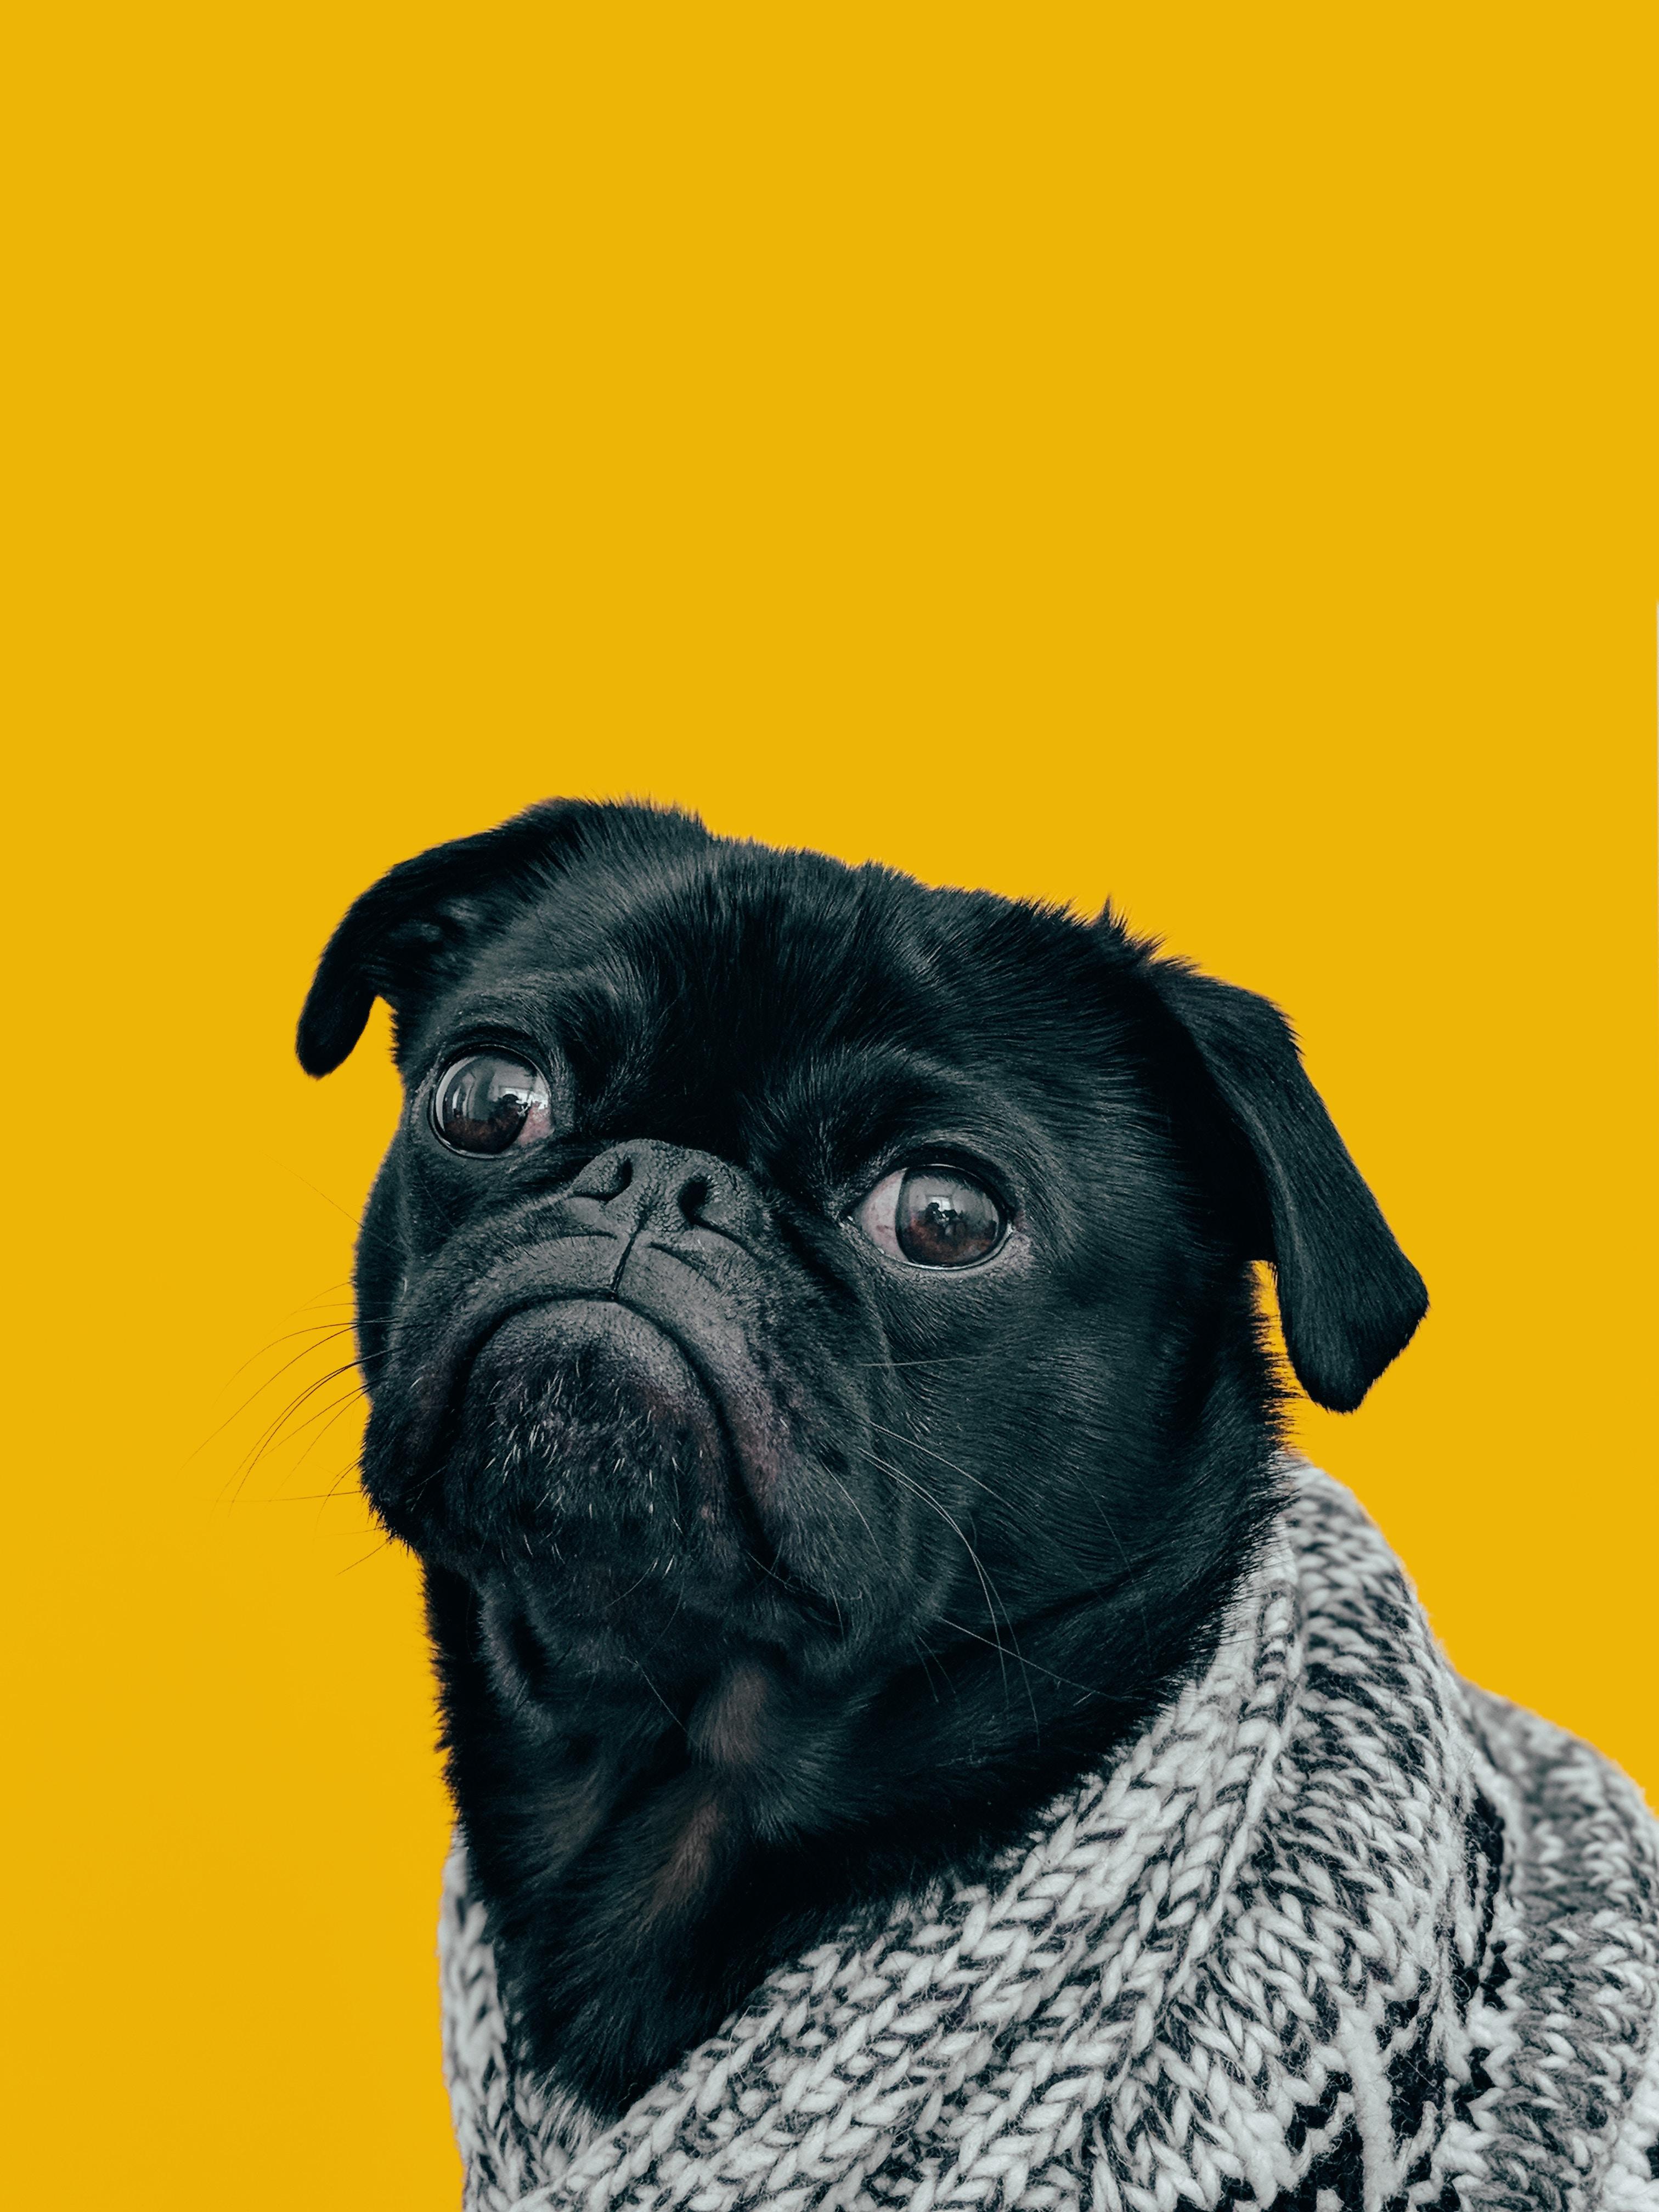 pug dog muzzle look scarf